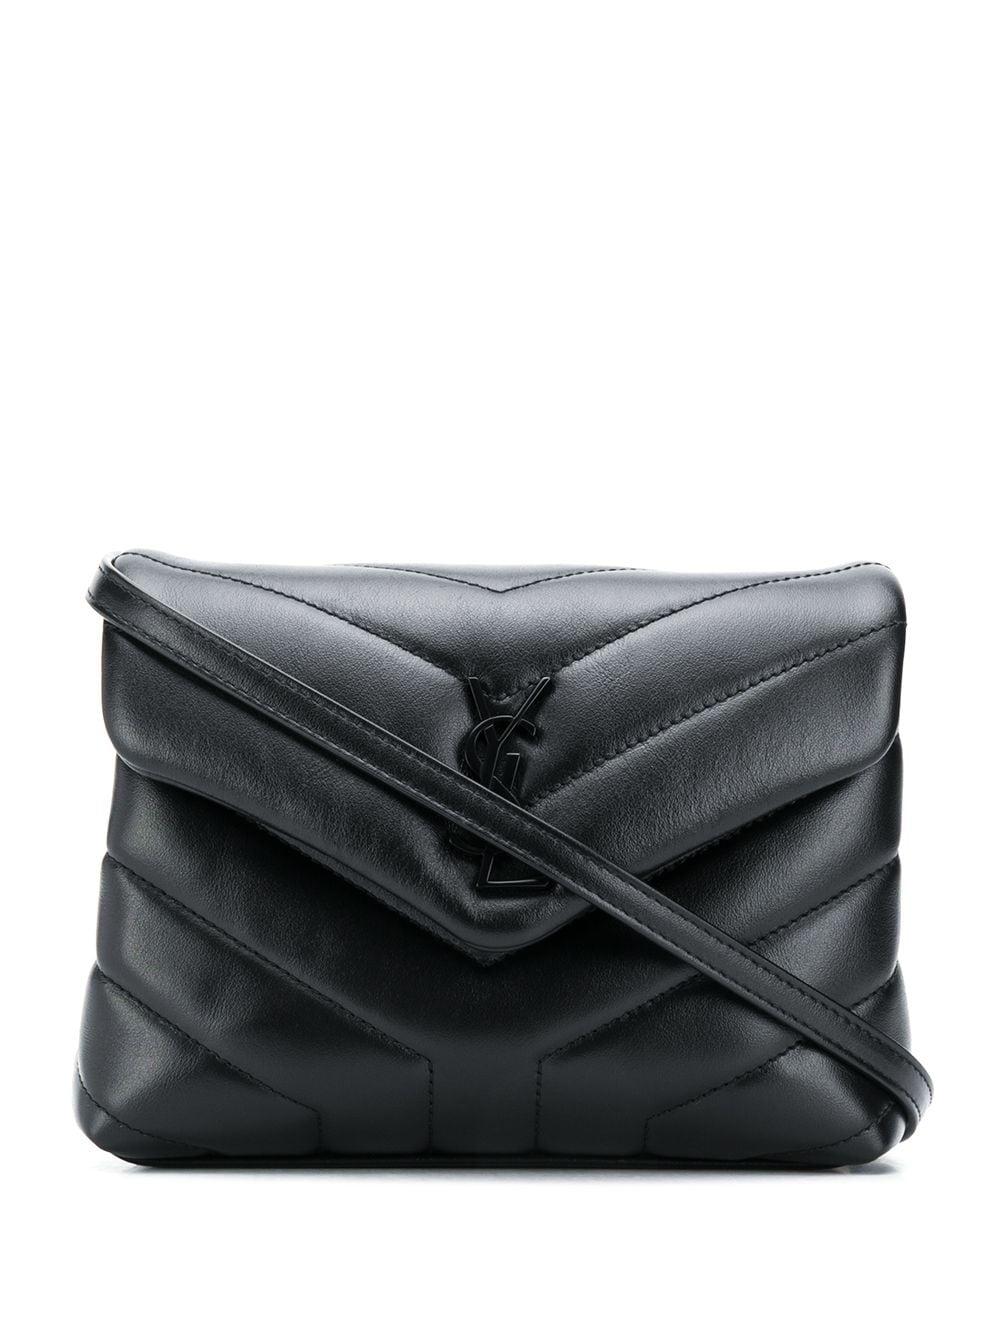 Loulou Toy Leather Mini Bag